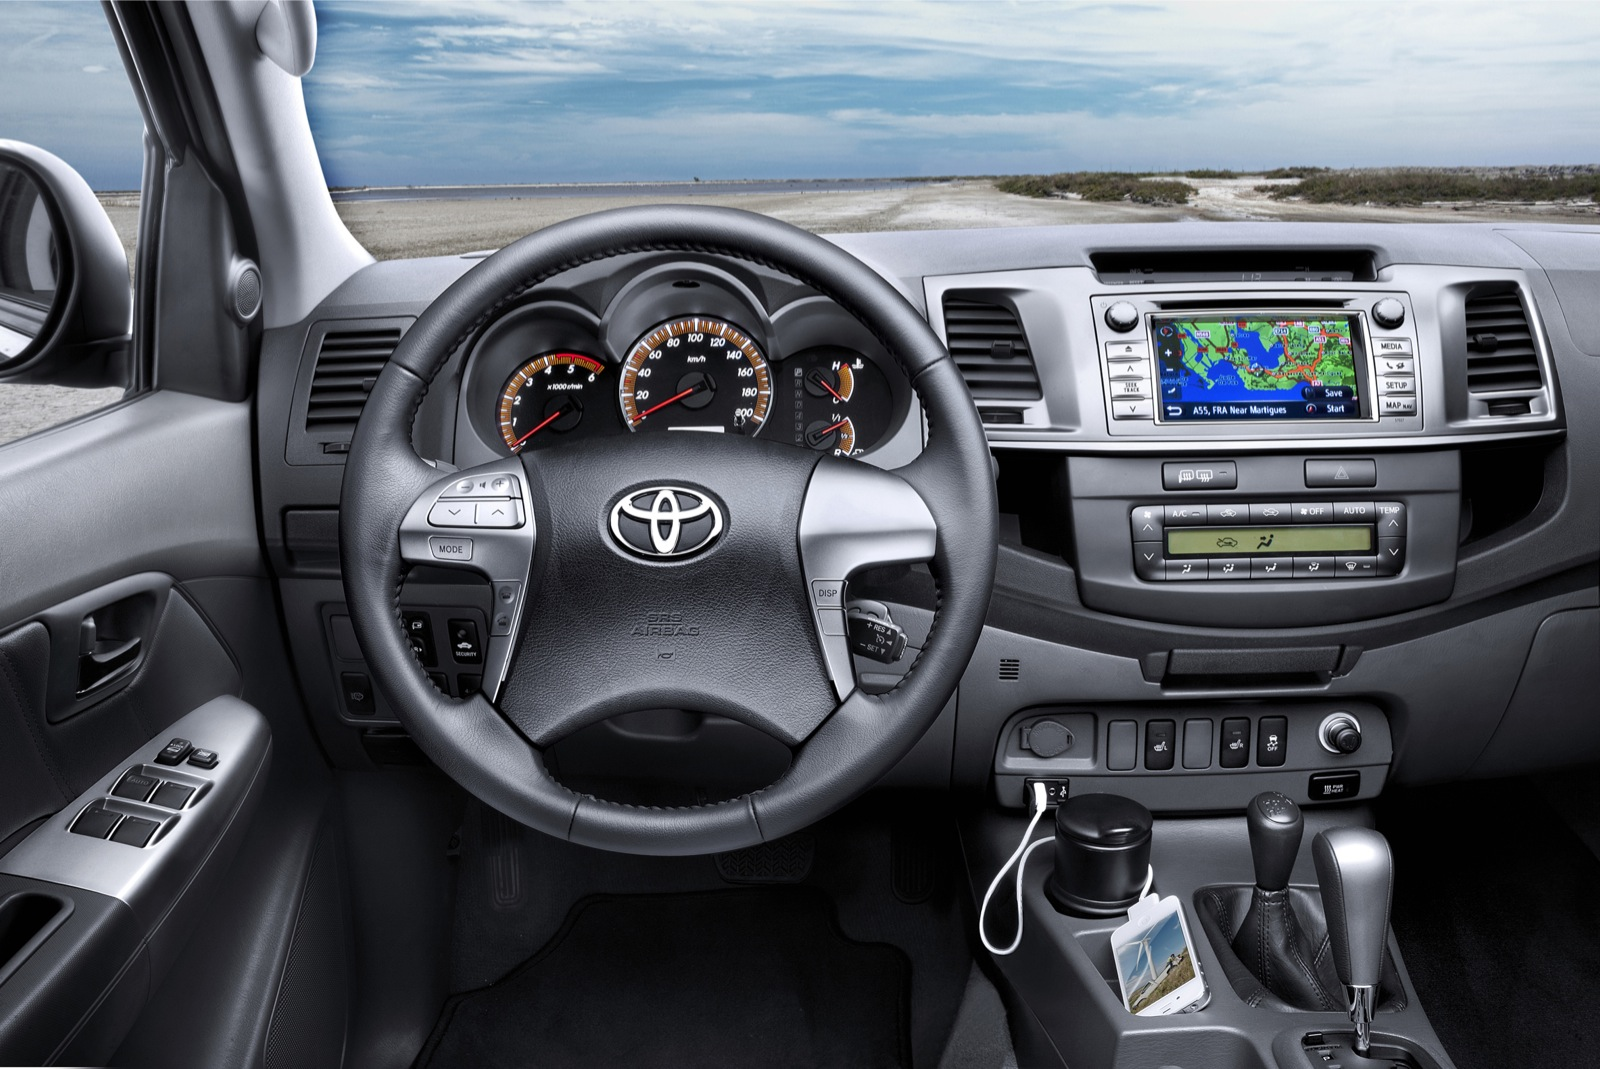 Toyota Hilux Double Cab quotazioni usato, listino Toyota Hilux Double